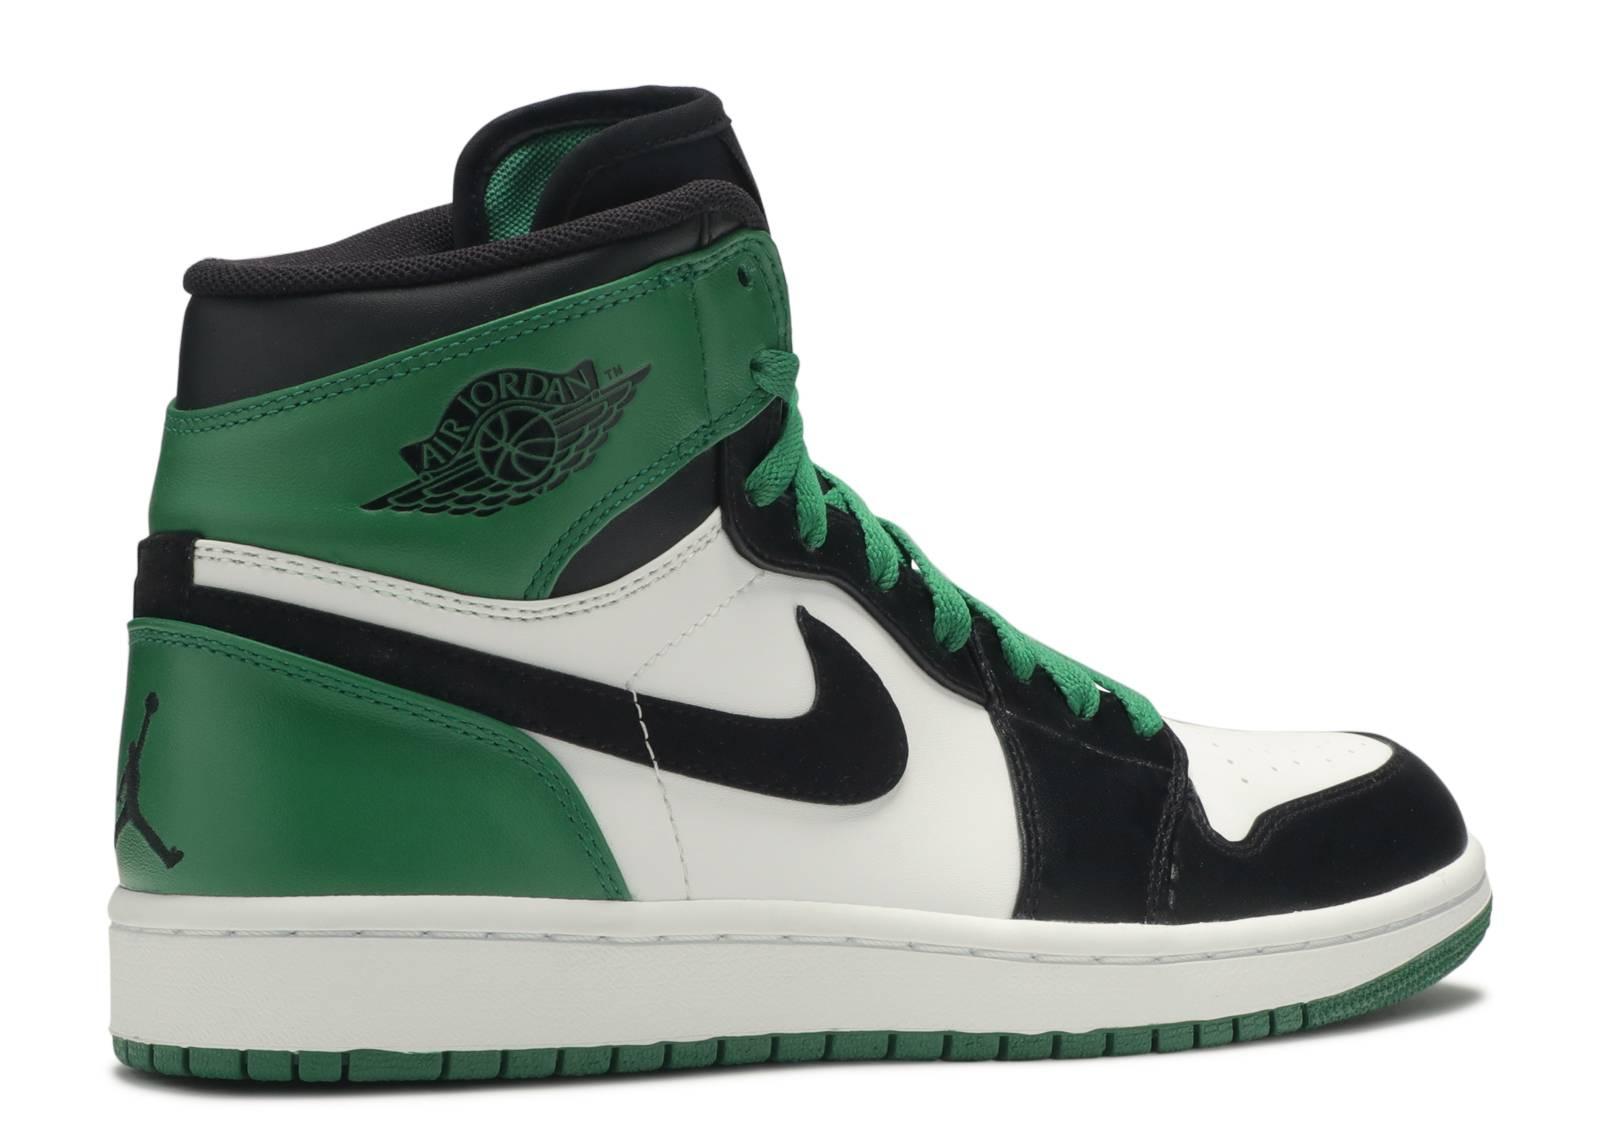 green jordan shoes